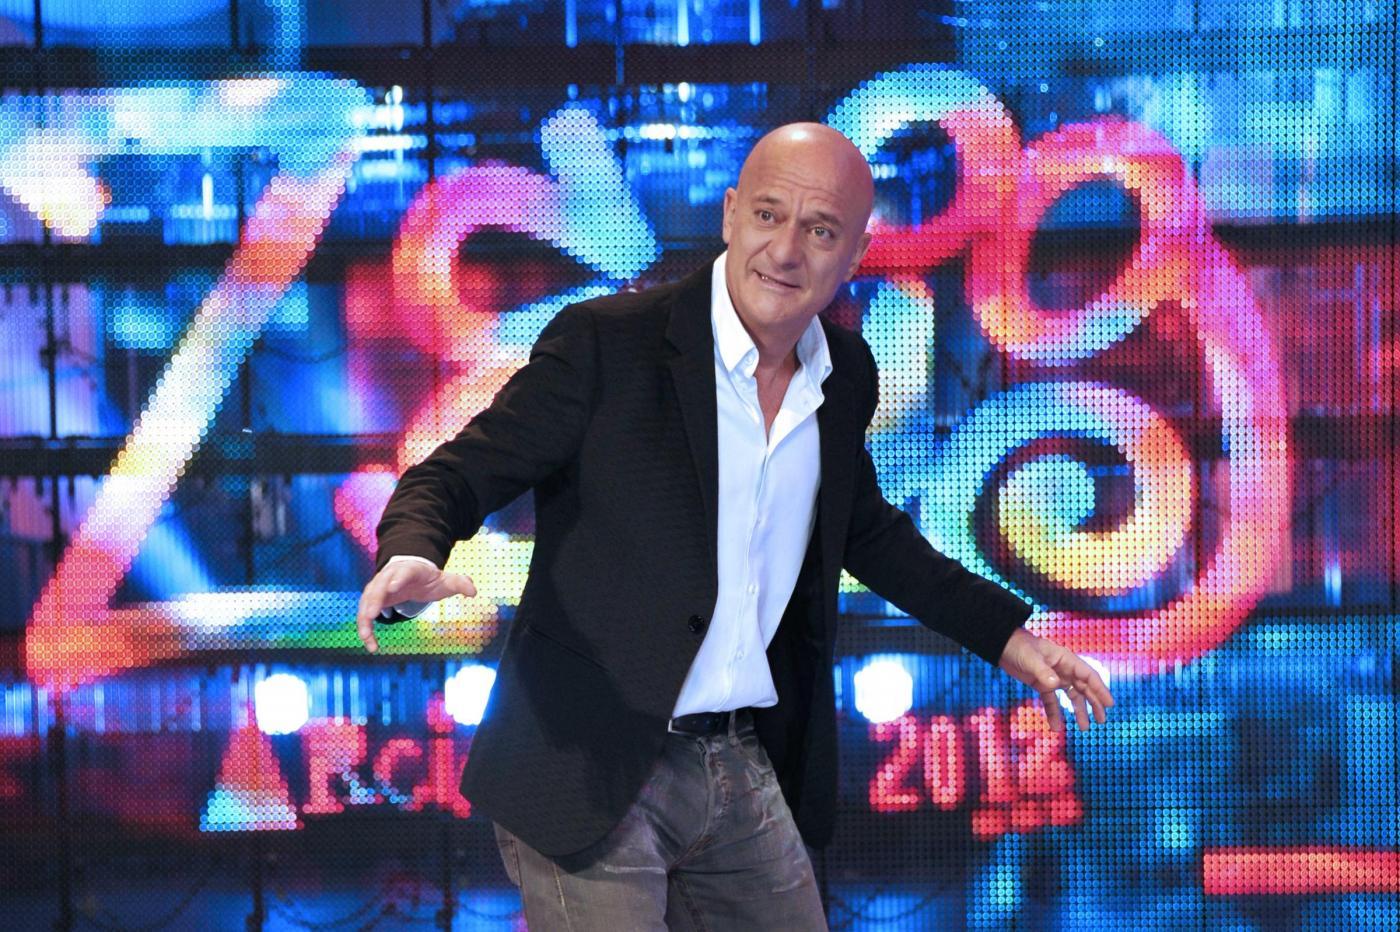 Ascolti tv venerdì 3 febbraio 2012: vince ancora Zelig